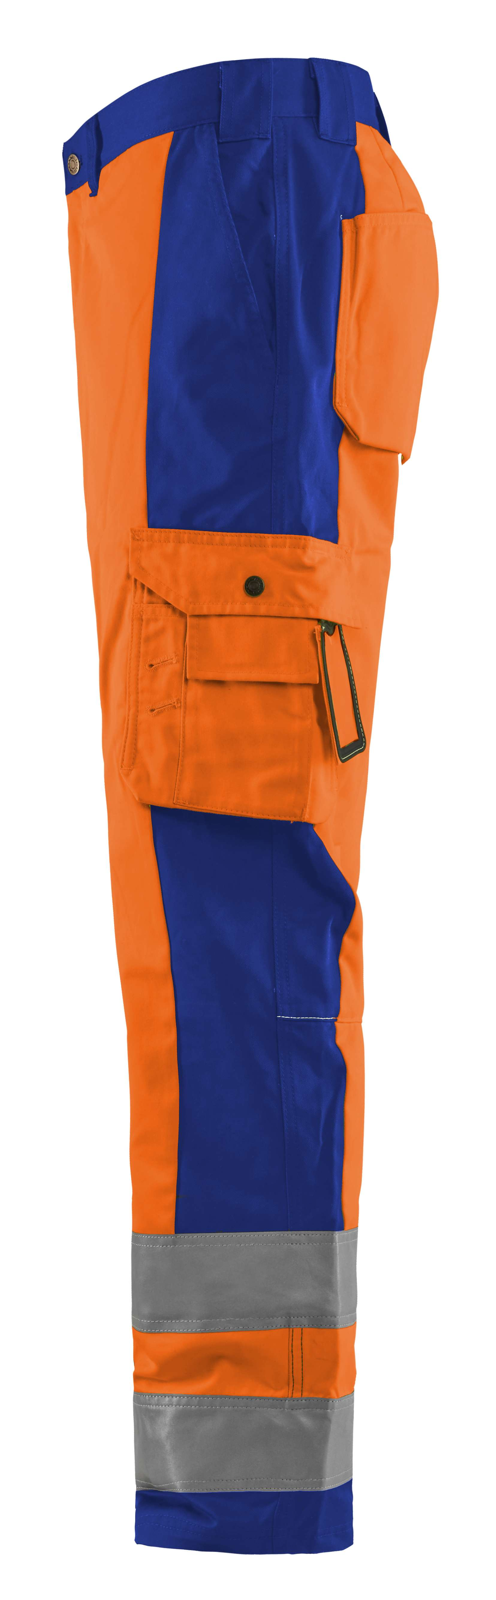 Blaklader Werkbroeken 15831860 High Vis oranje-korenblauw(5385)